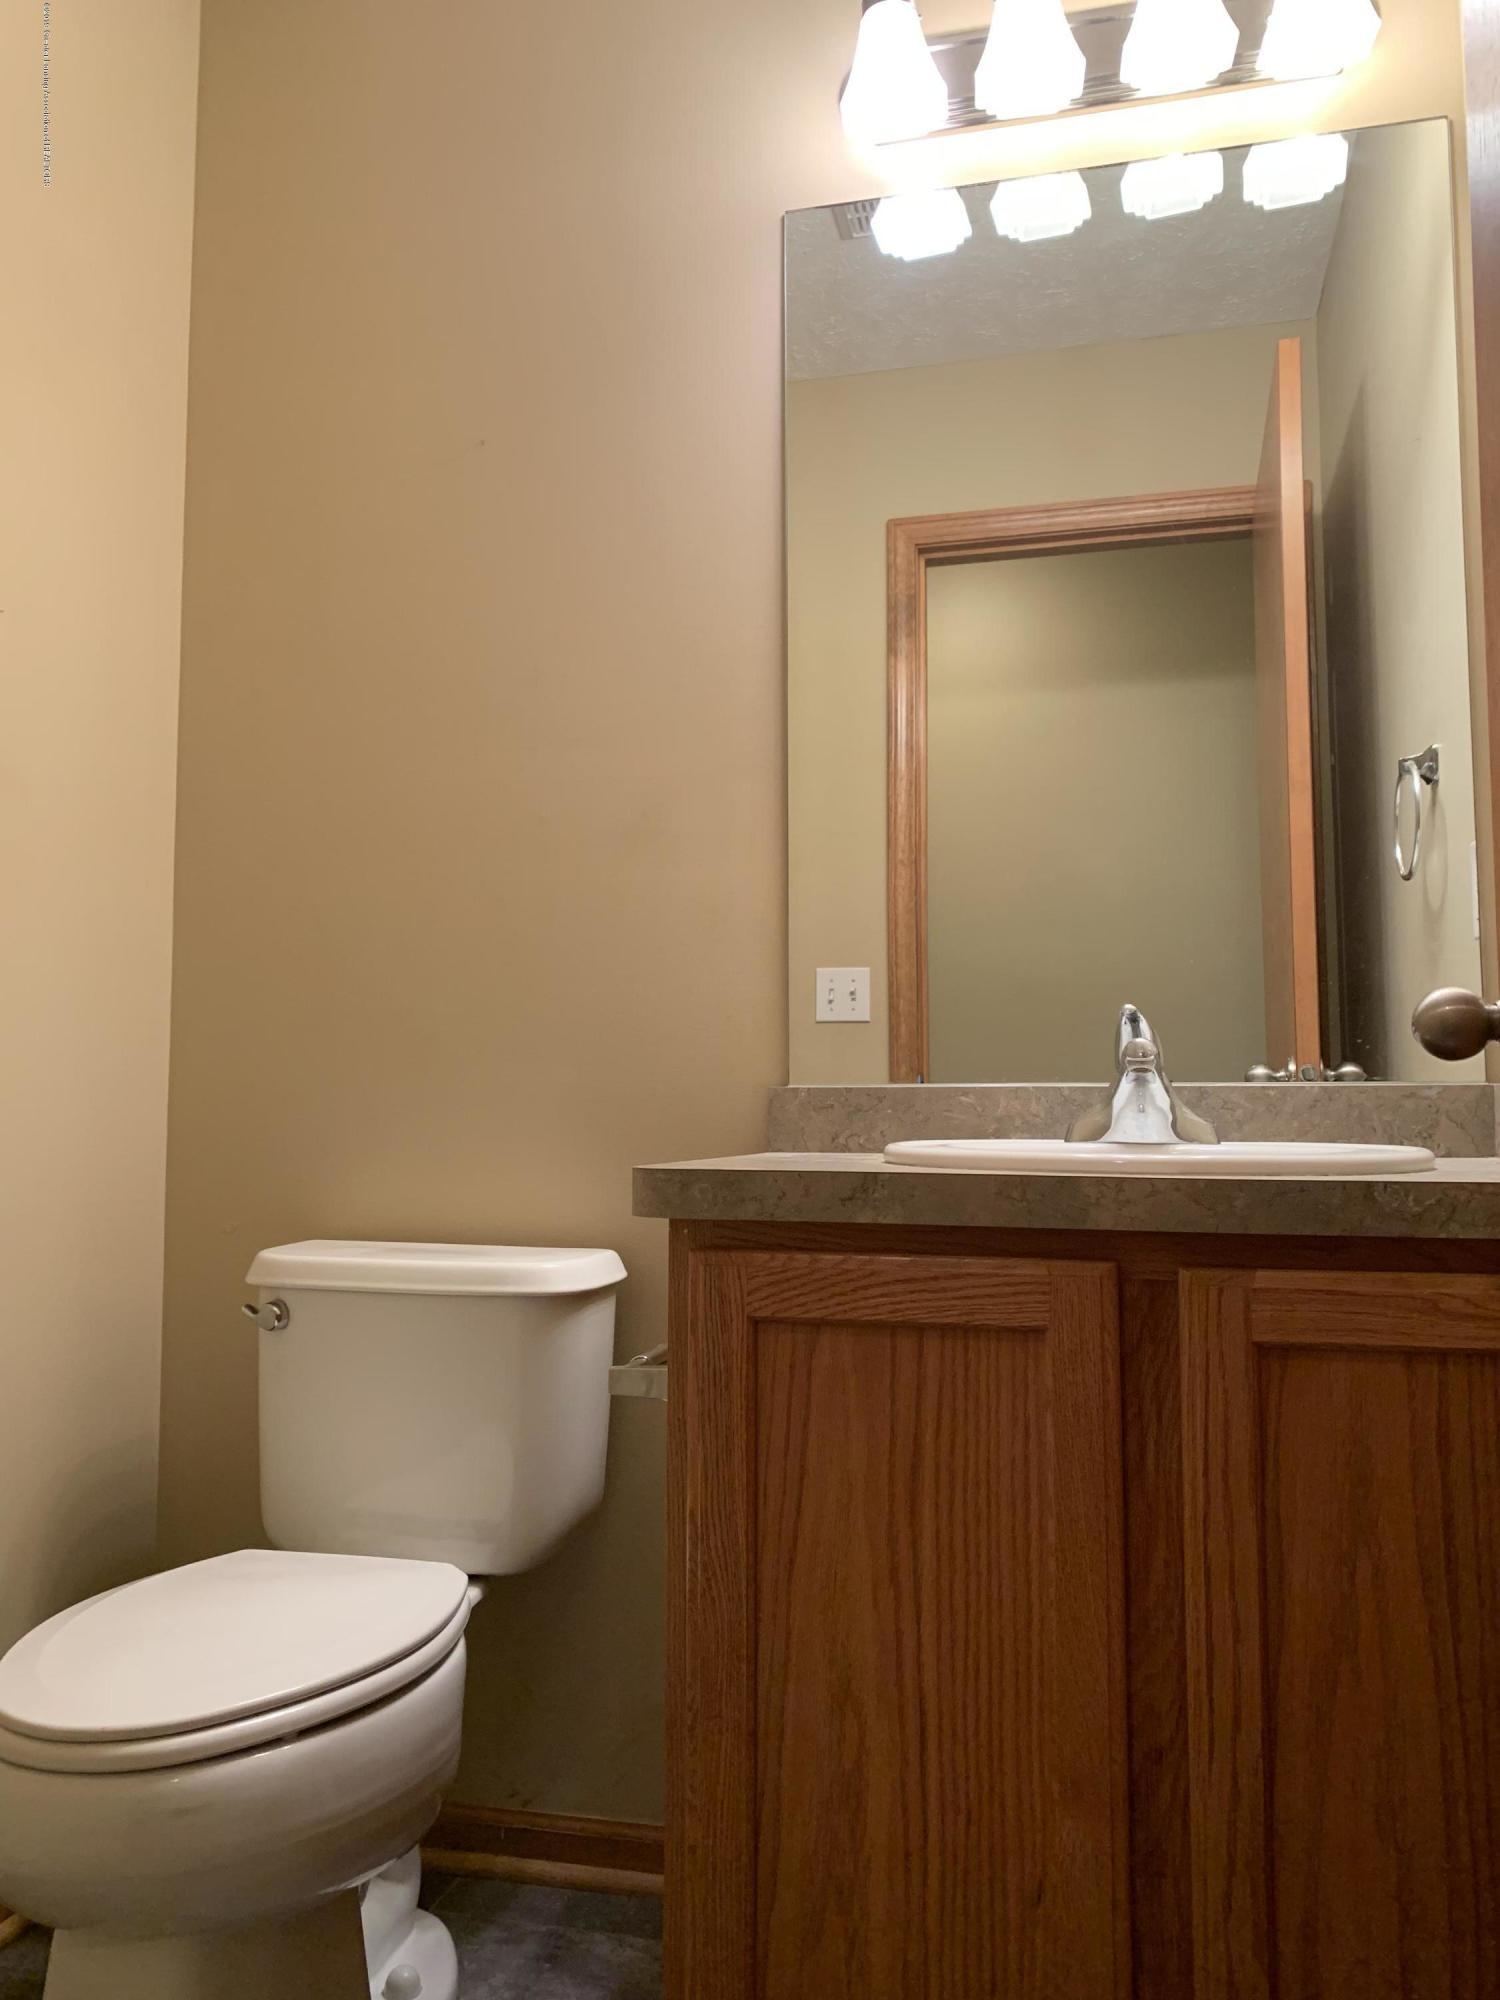 14705 Hardtke Dr - Bathroom - 31